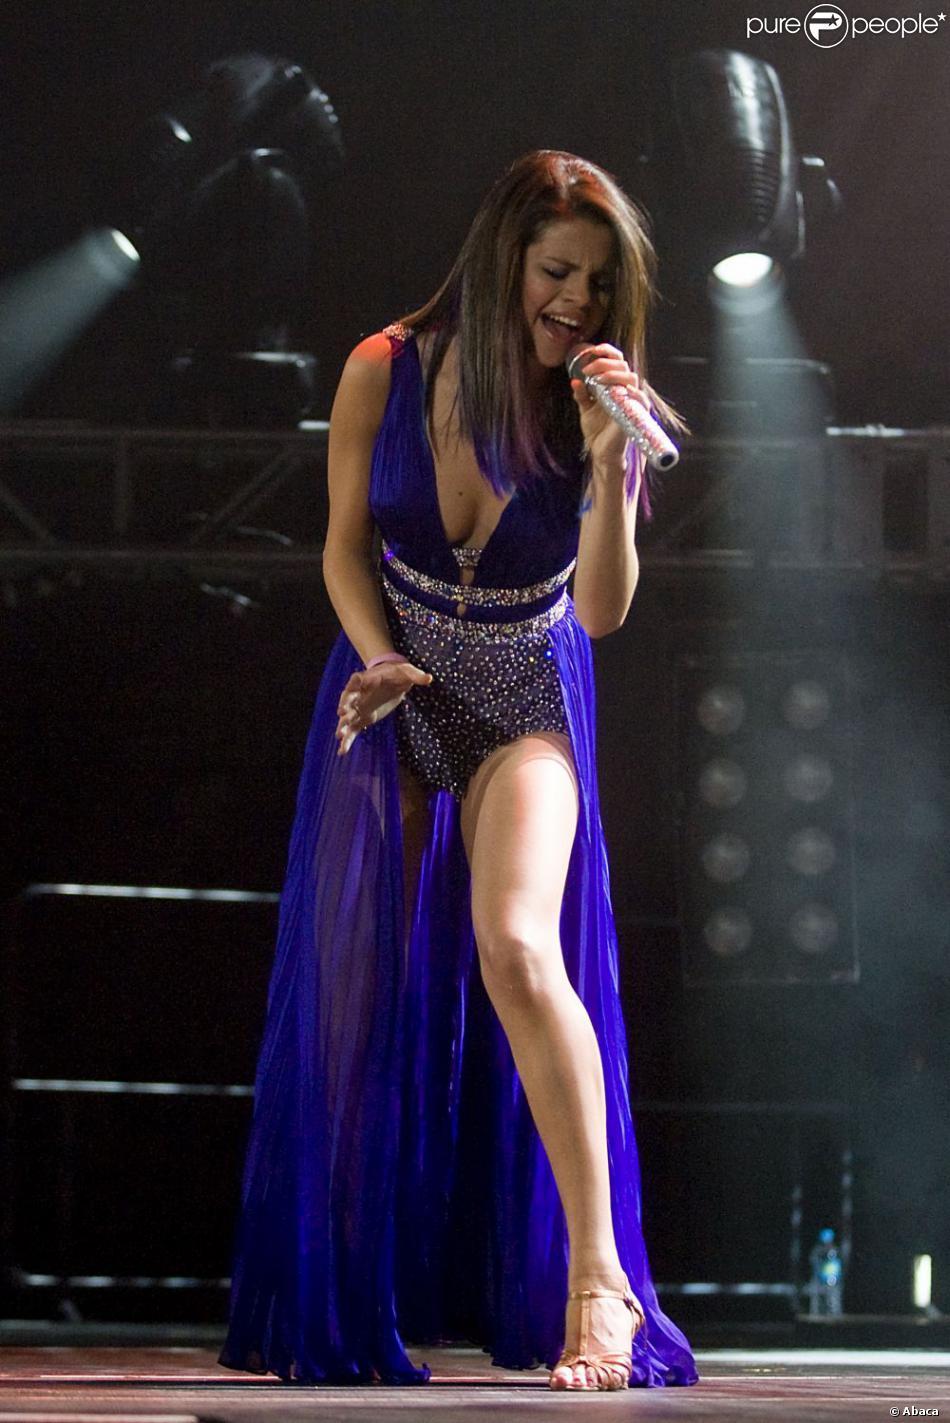 La petite Selena Gomez rivalise avec les plus grandes stars lorsqu'il ... джастин бибер